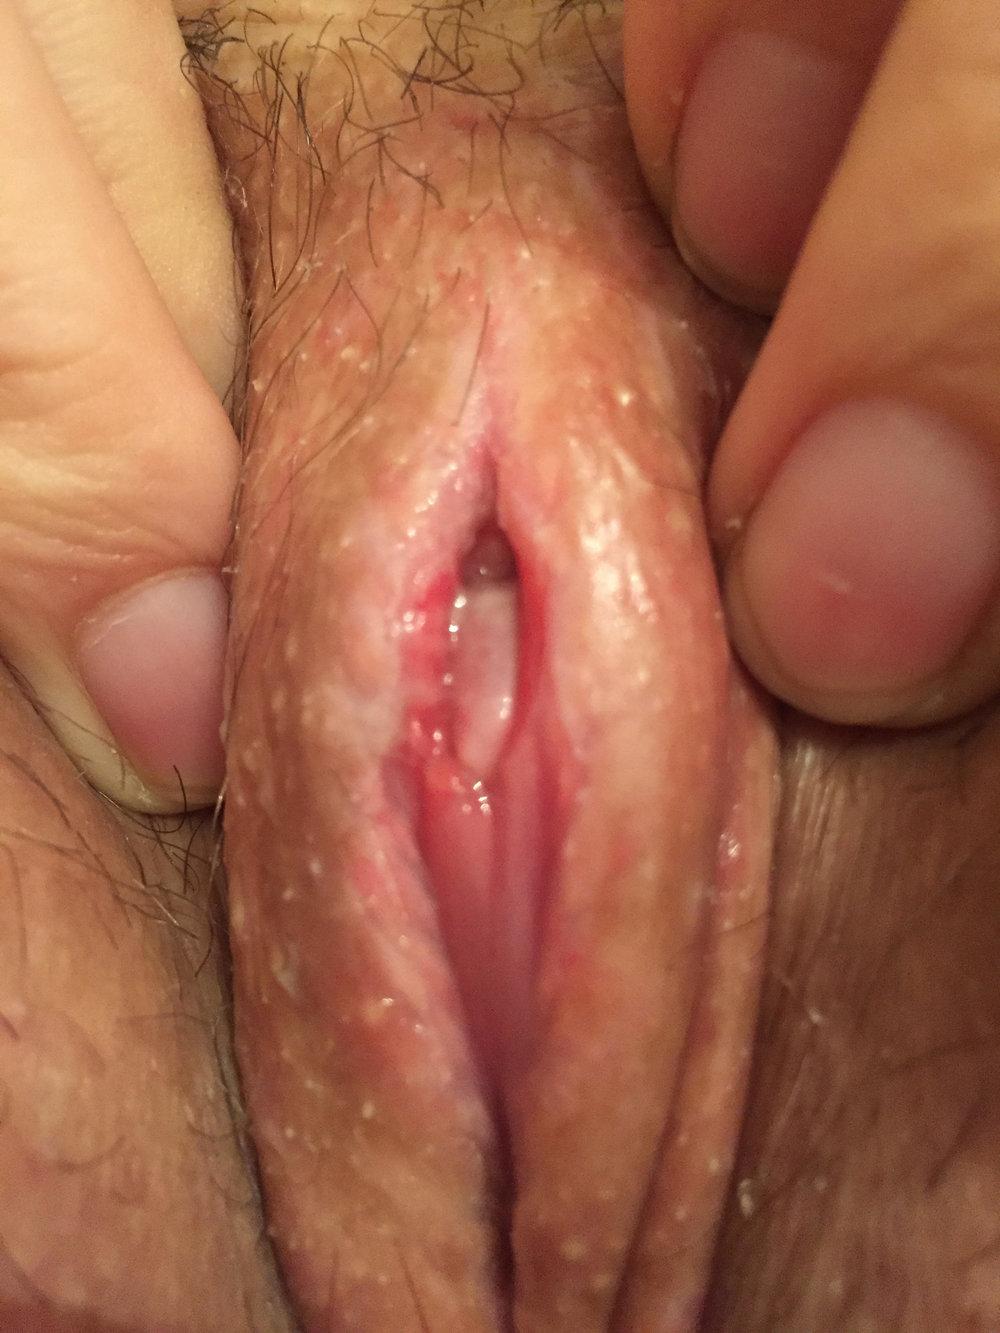 clitoris7.jpg